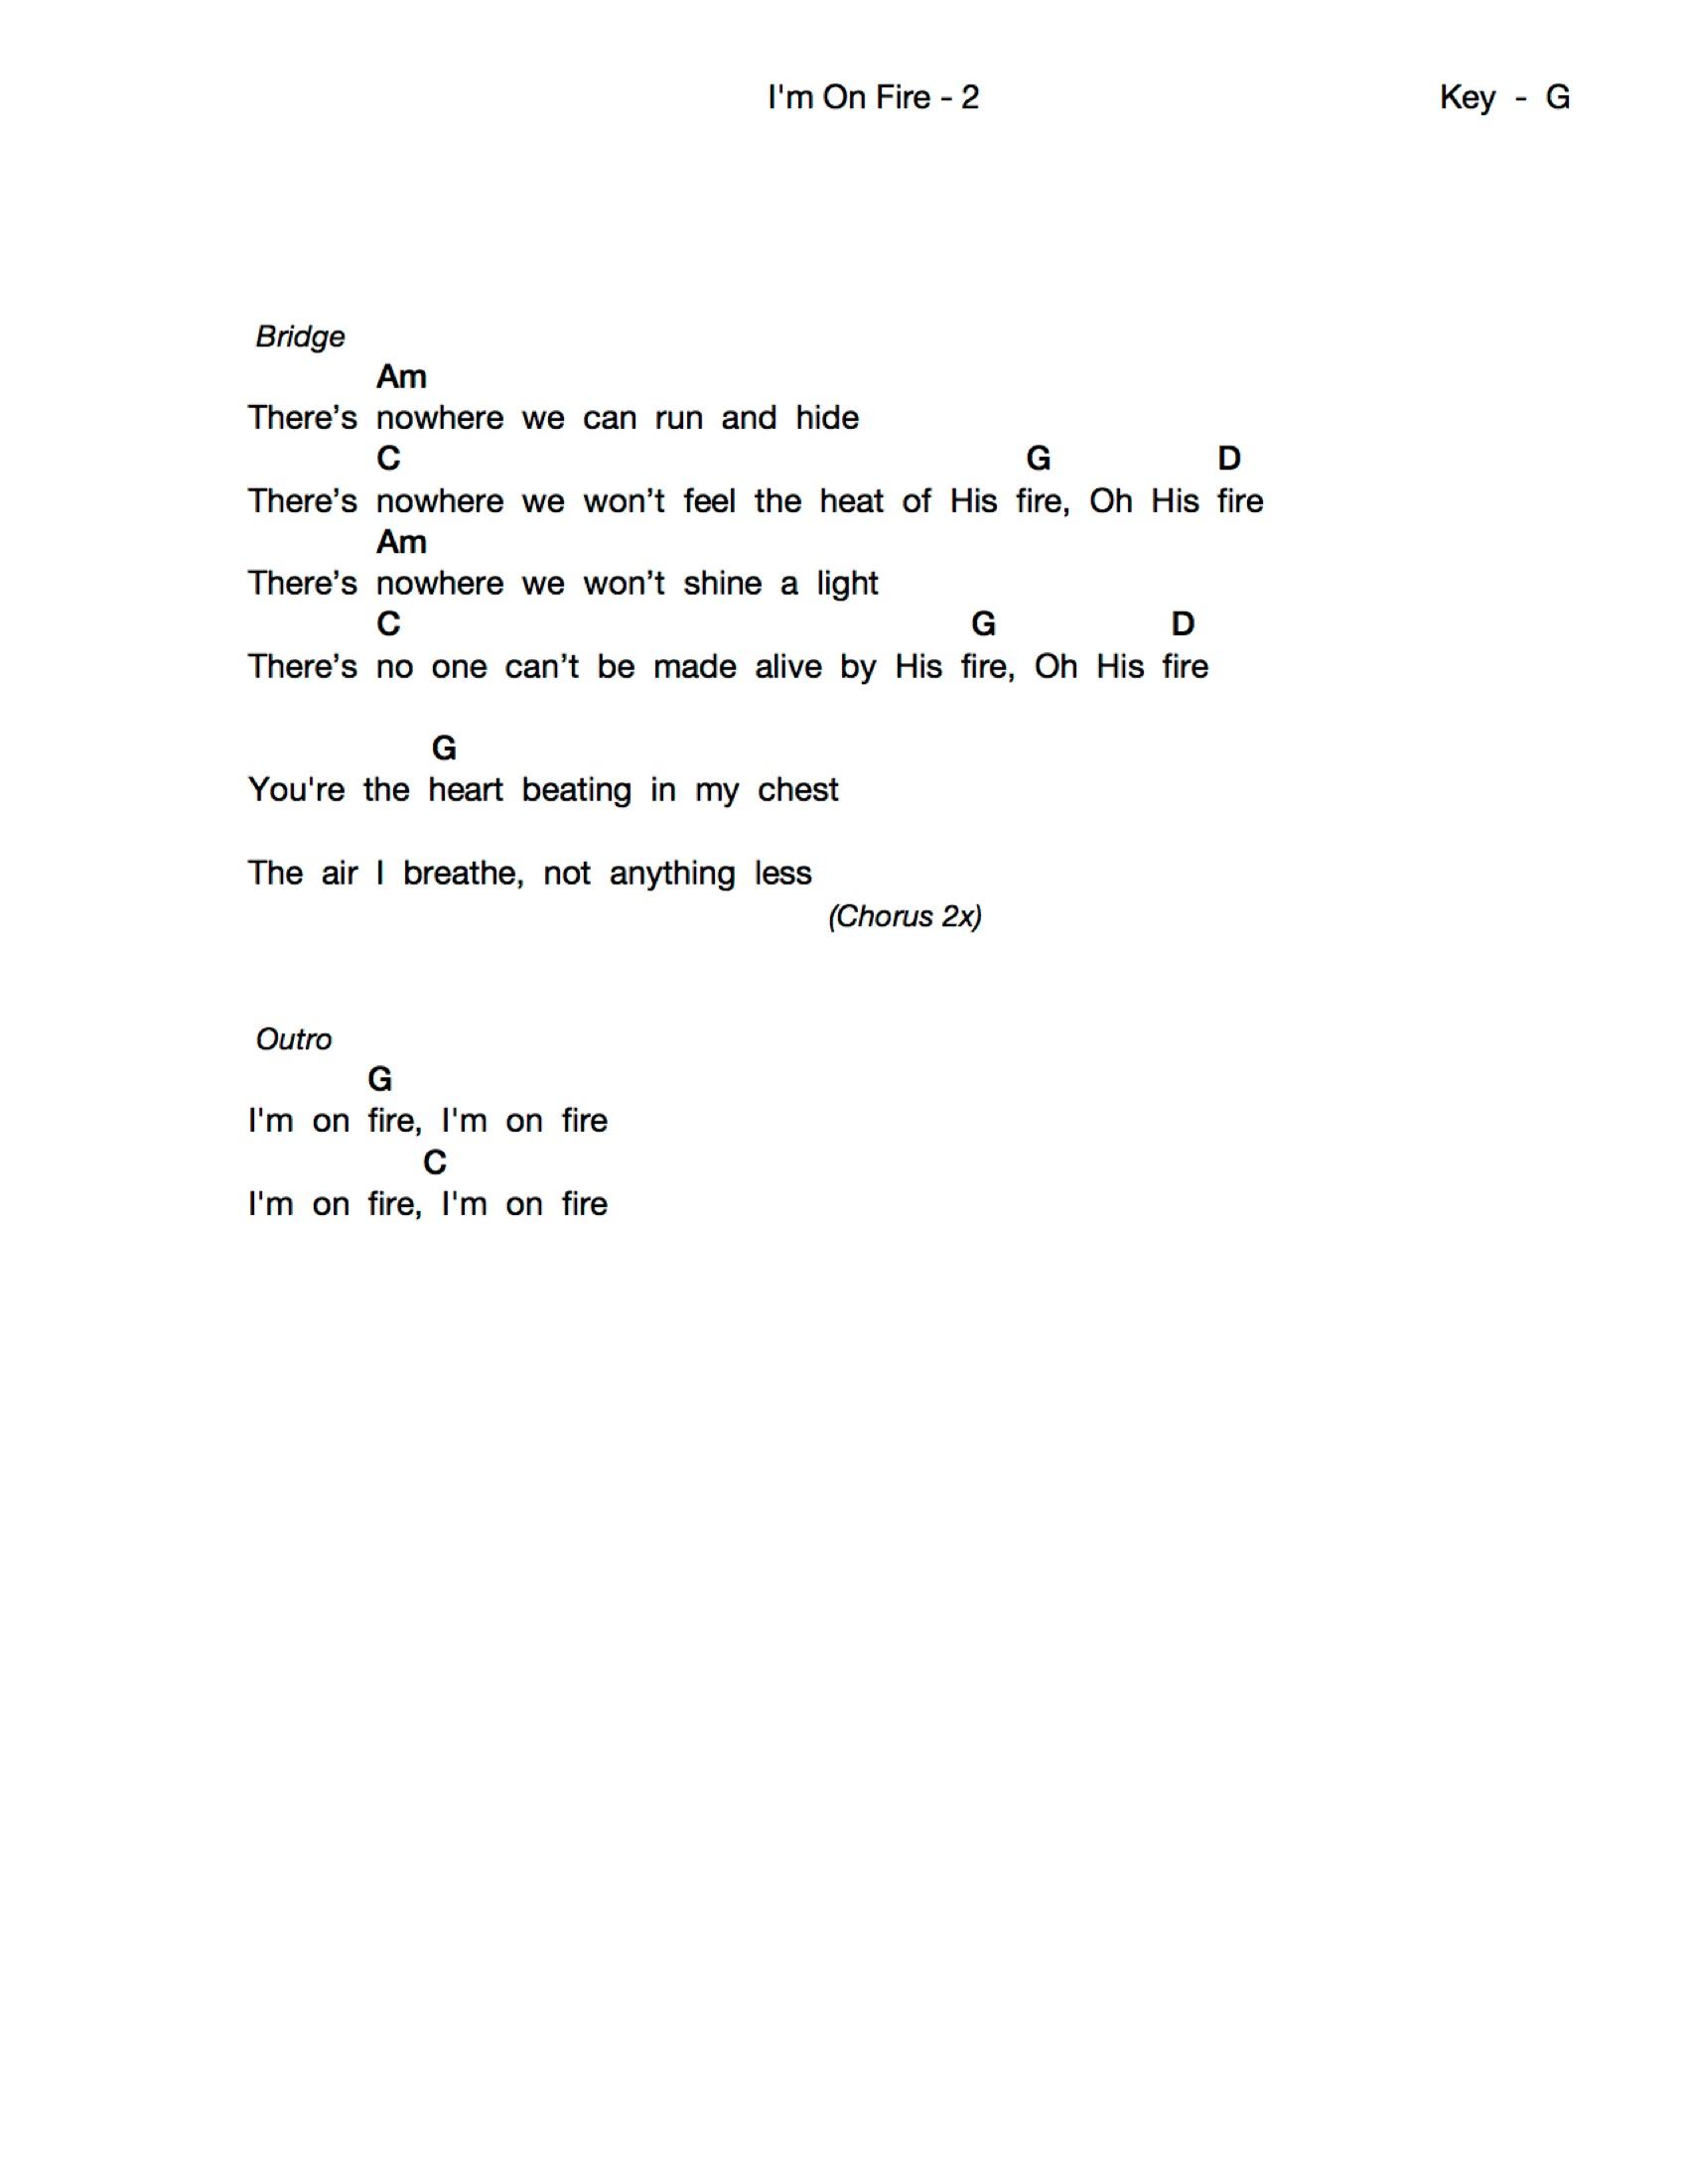 You Won T Relent Chords Im On Fire Wordworship Mp3 Downloads Streaming Music Lyrics